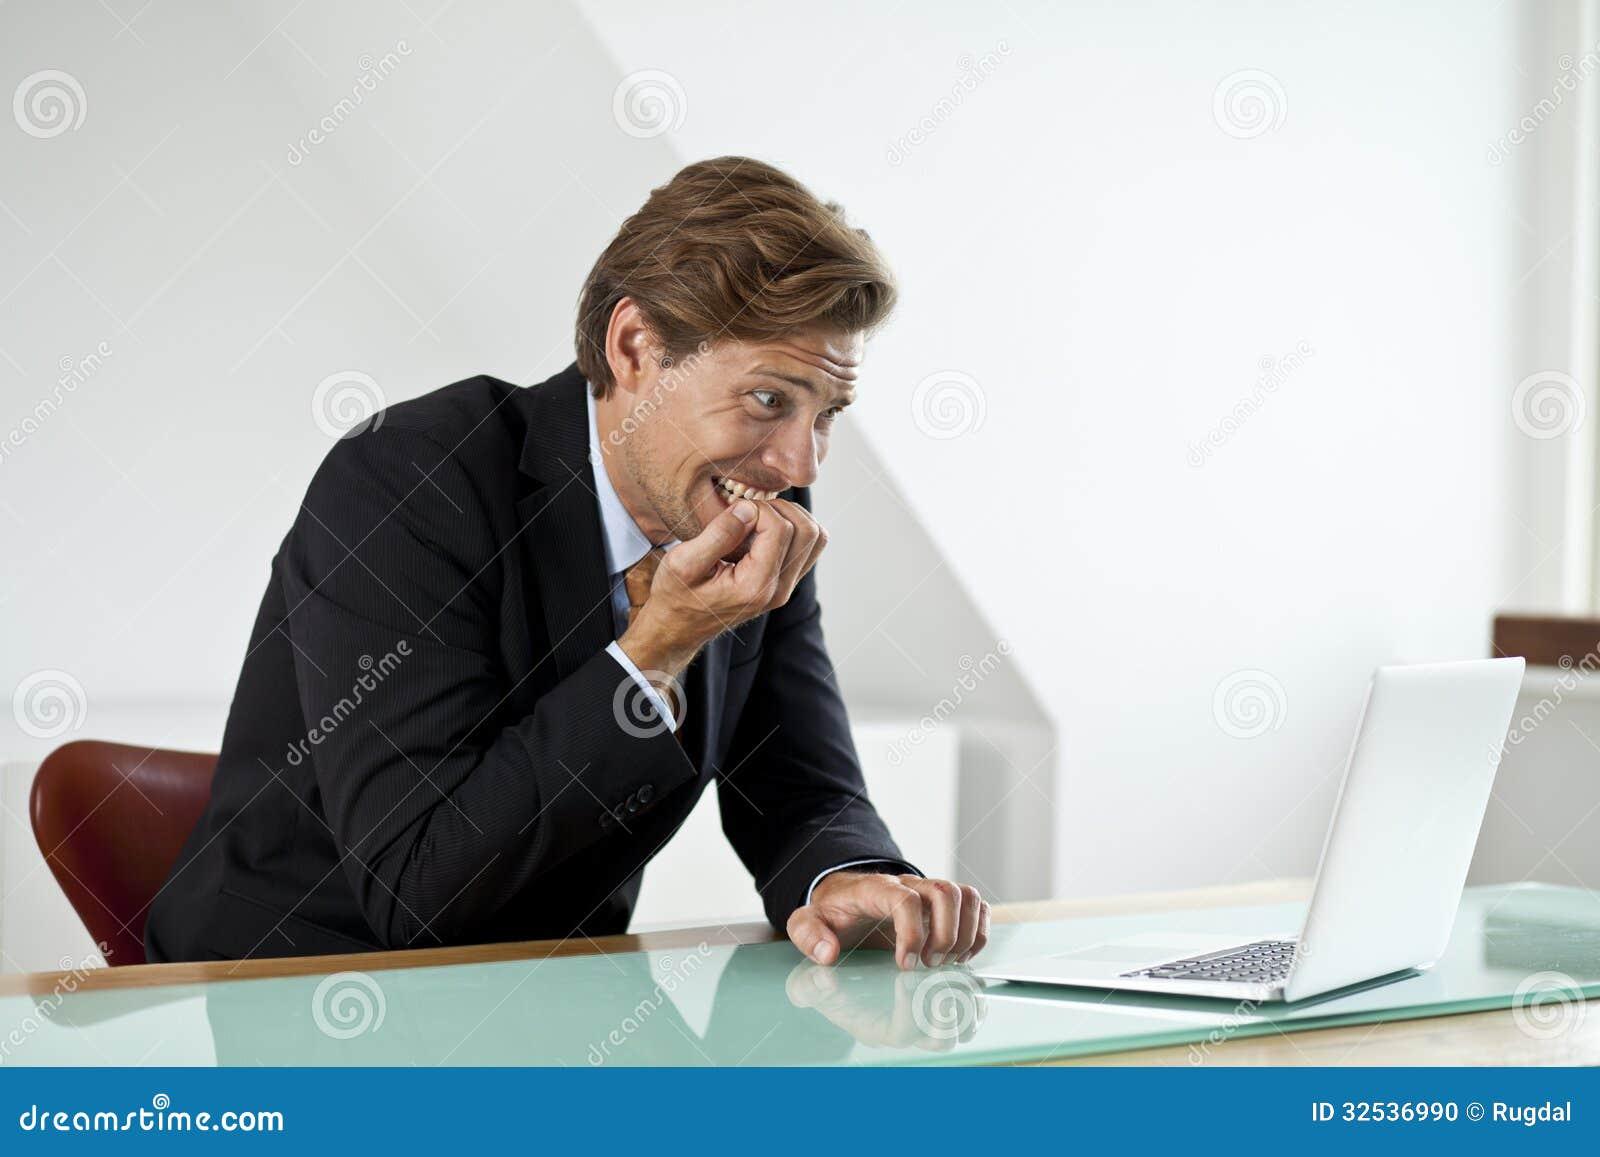 Anxious businessman looking at laptop